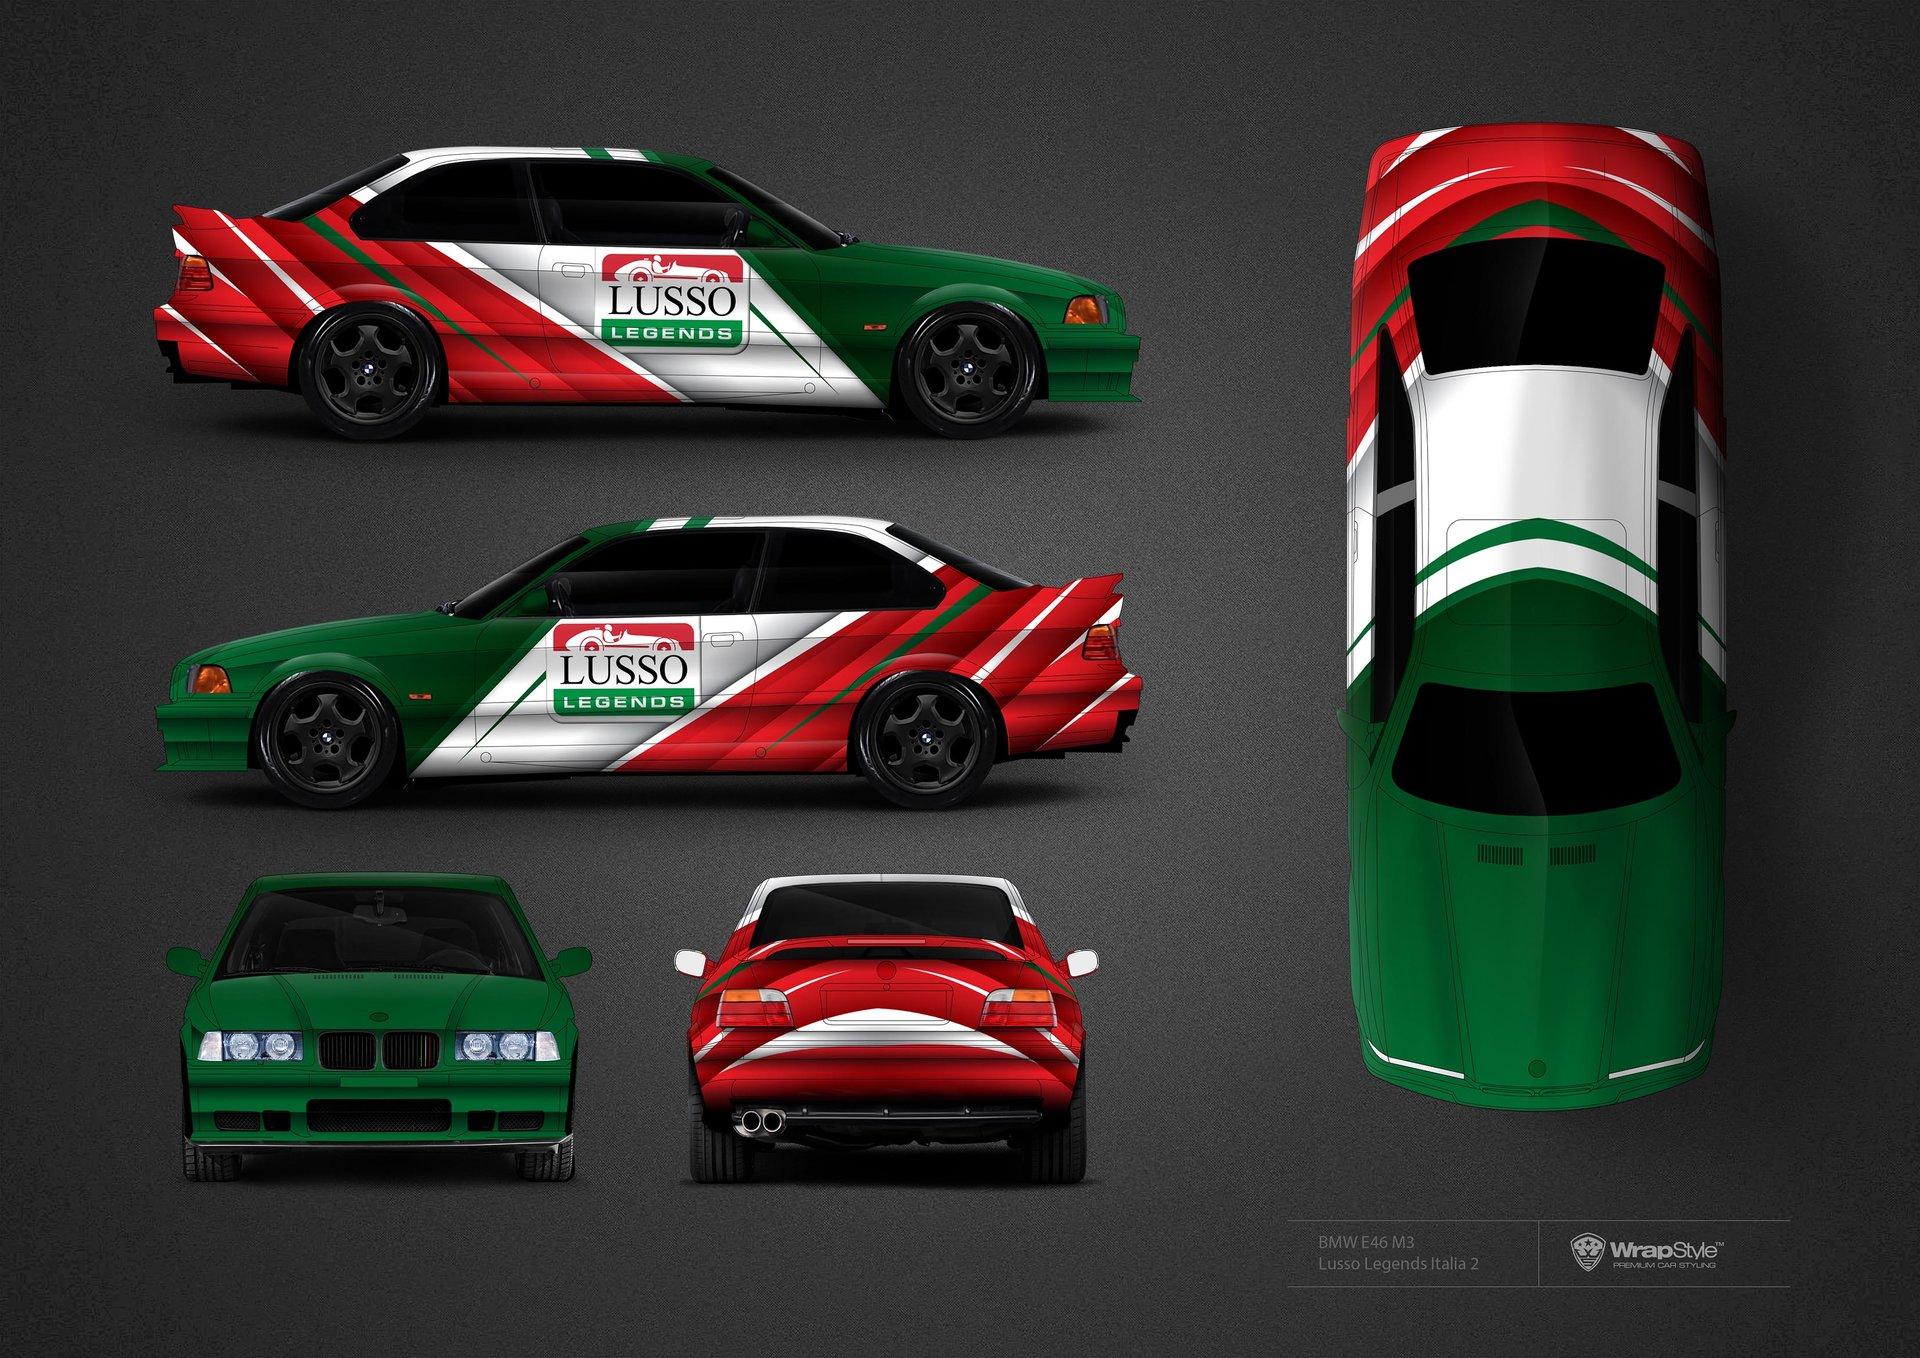 Bmw E46 M3 Lusso Legends Italia Design Wrapstyle